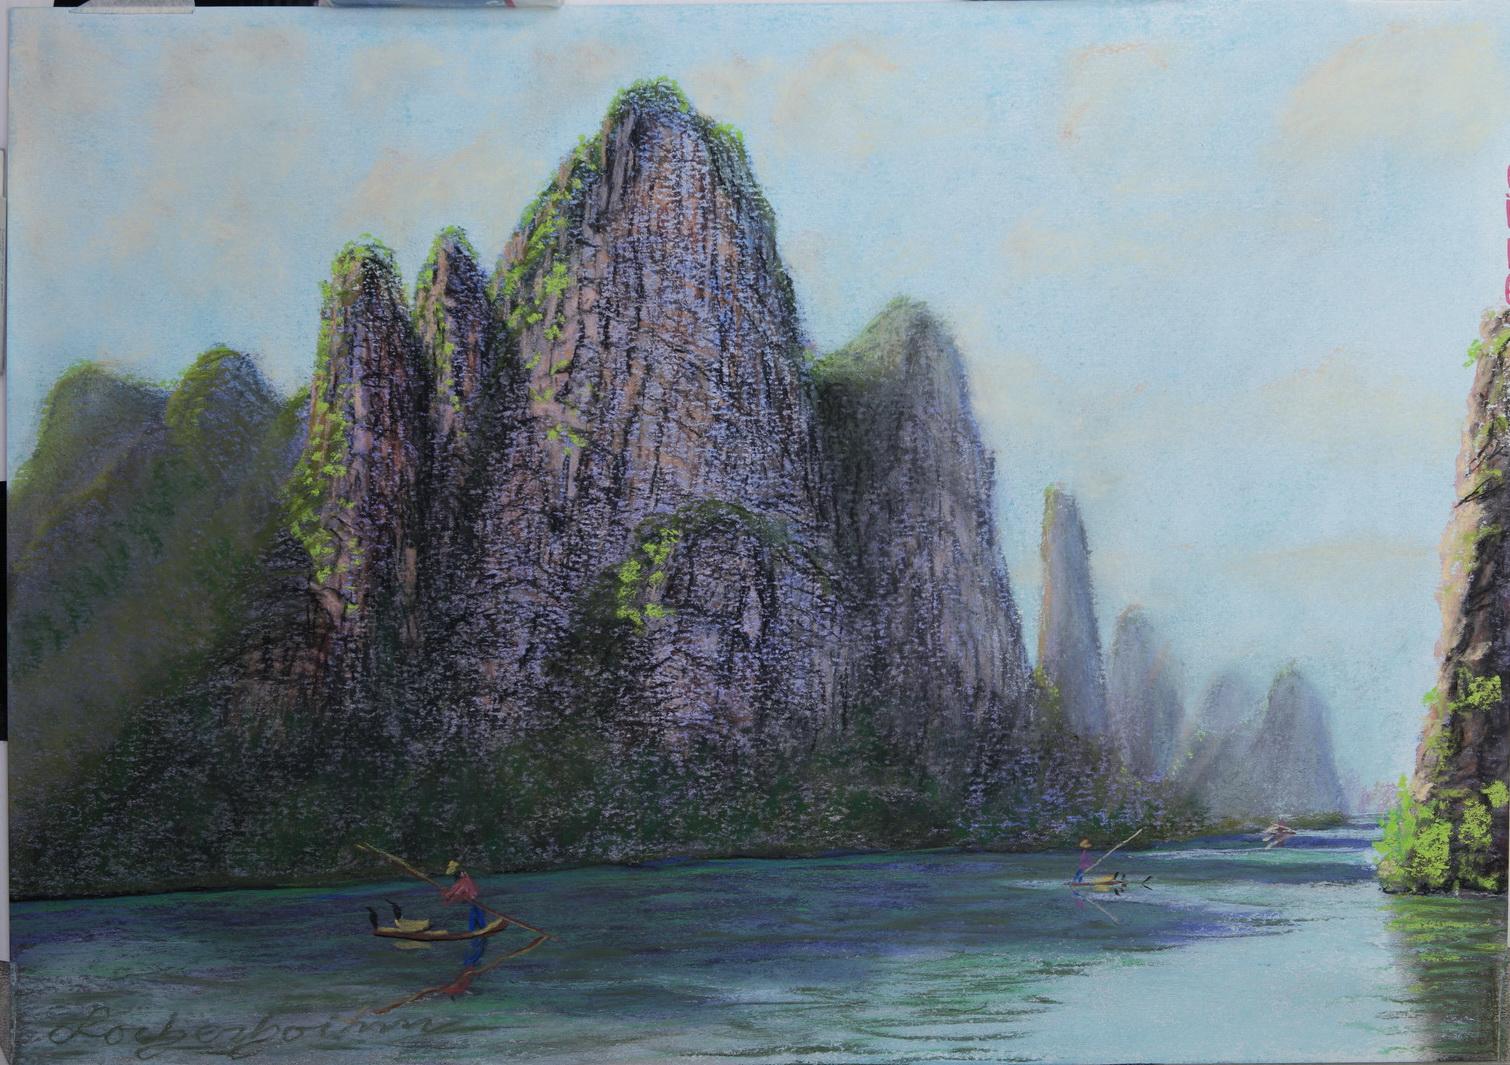 Fishing with Cormorant on Li River,Yangshuo, Guilin, Guangxi, China. Lorberboim Soft Pastel Painting.